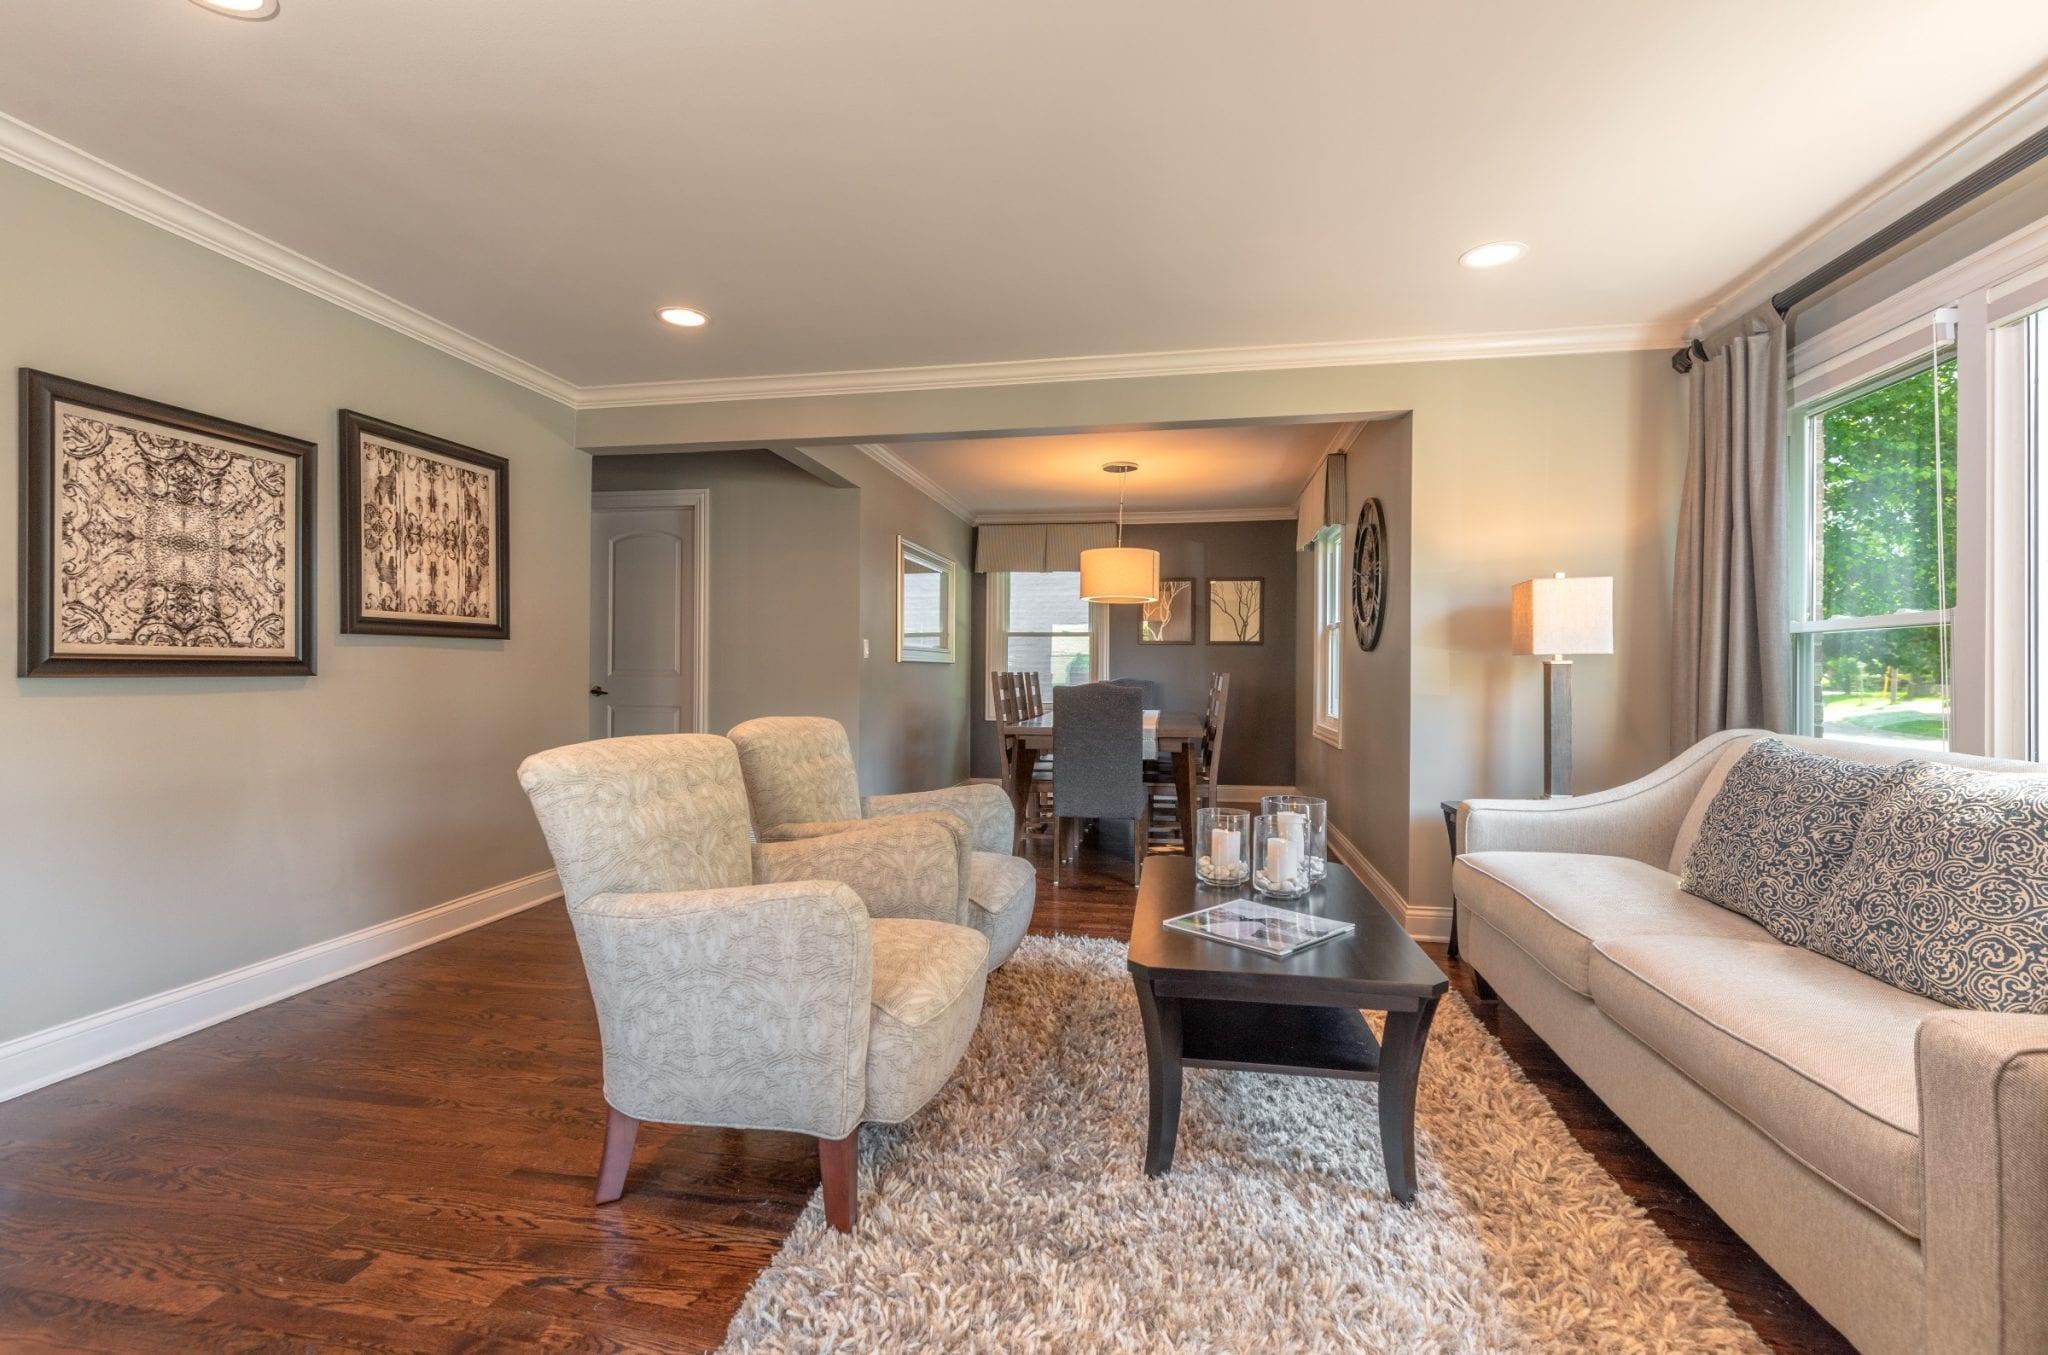 Interior Design & Build Arlington Heights IL